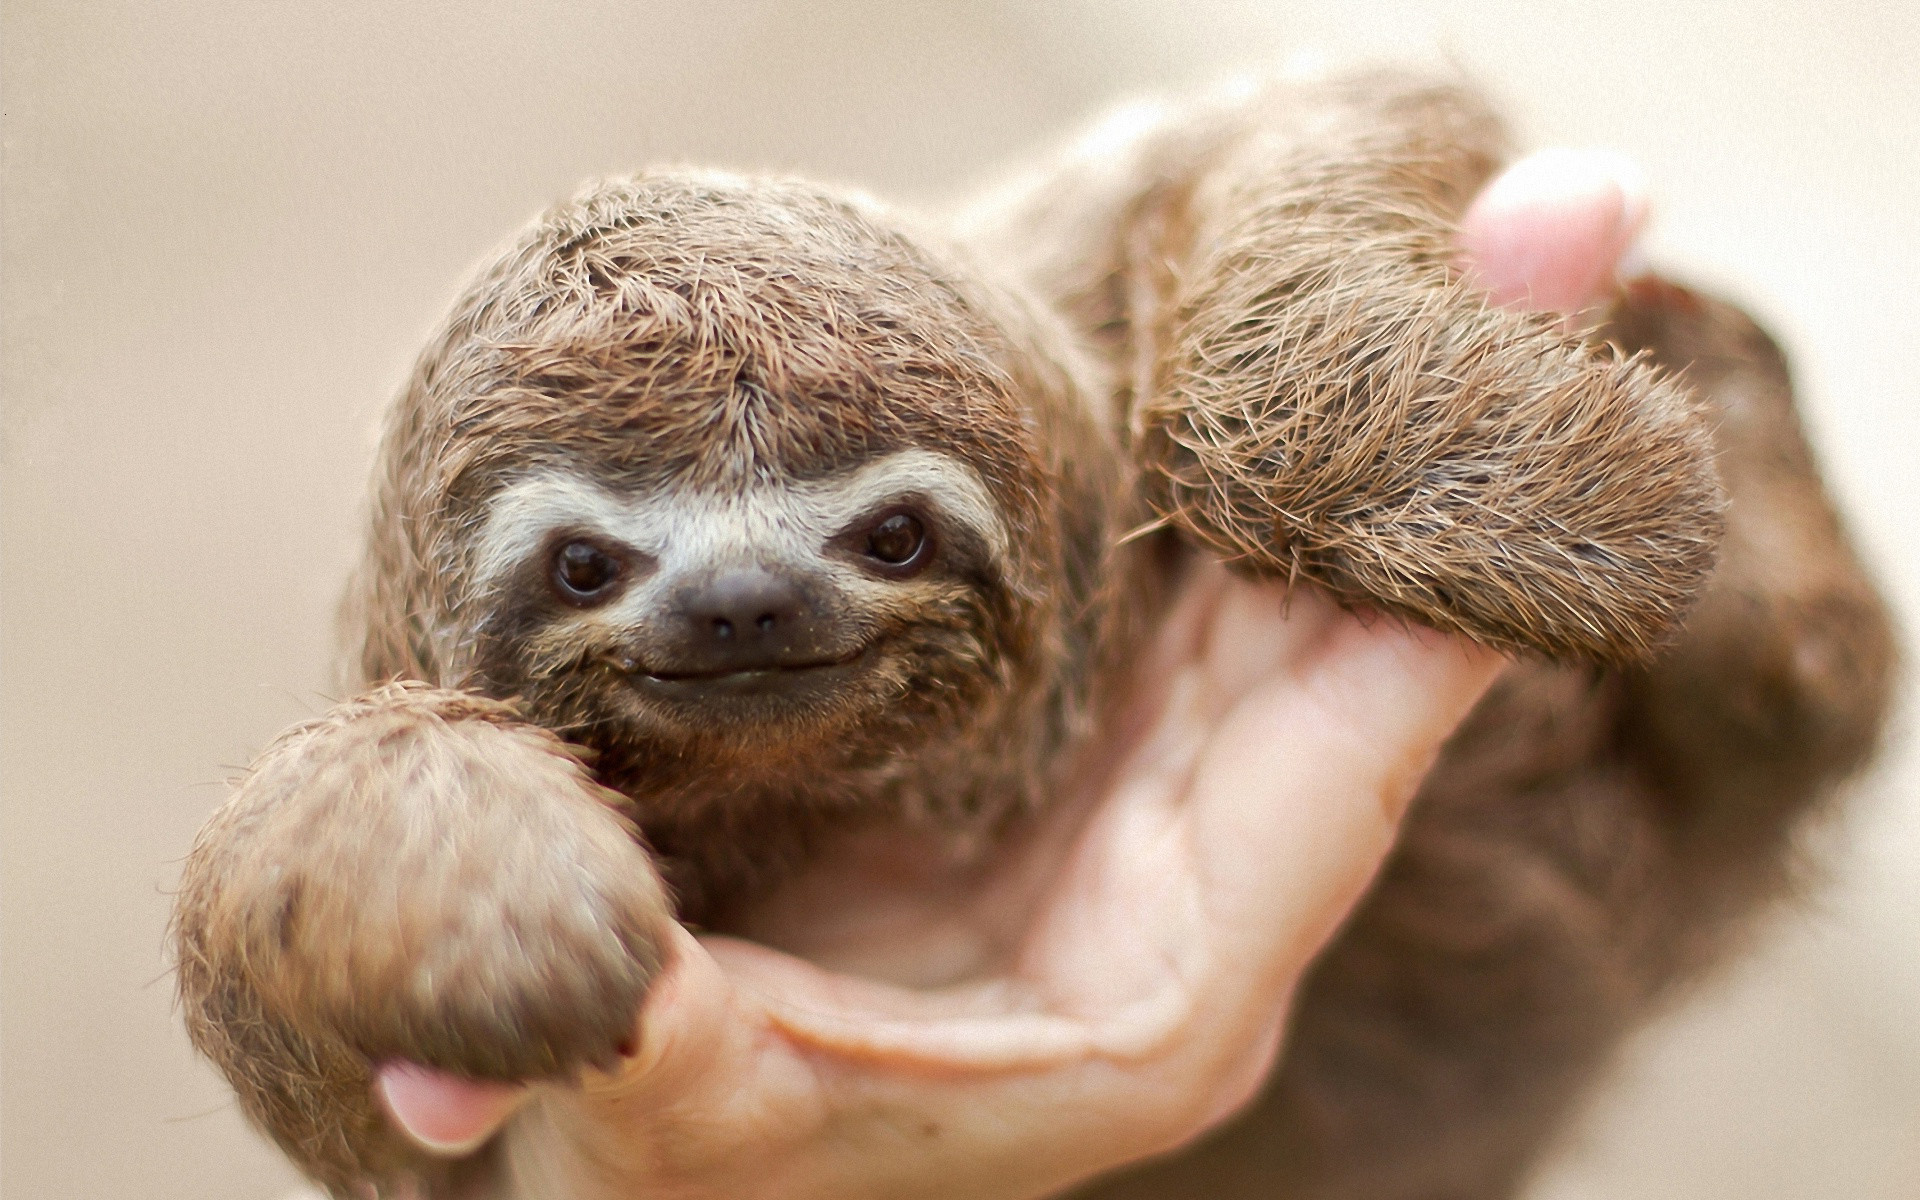 Sloth, animal, cute, gray, sloth